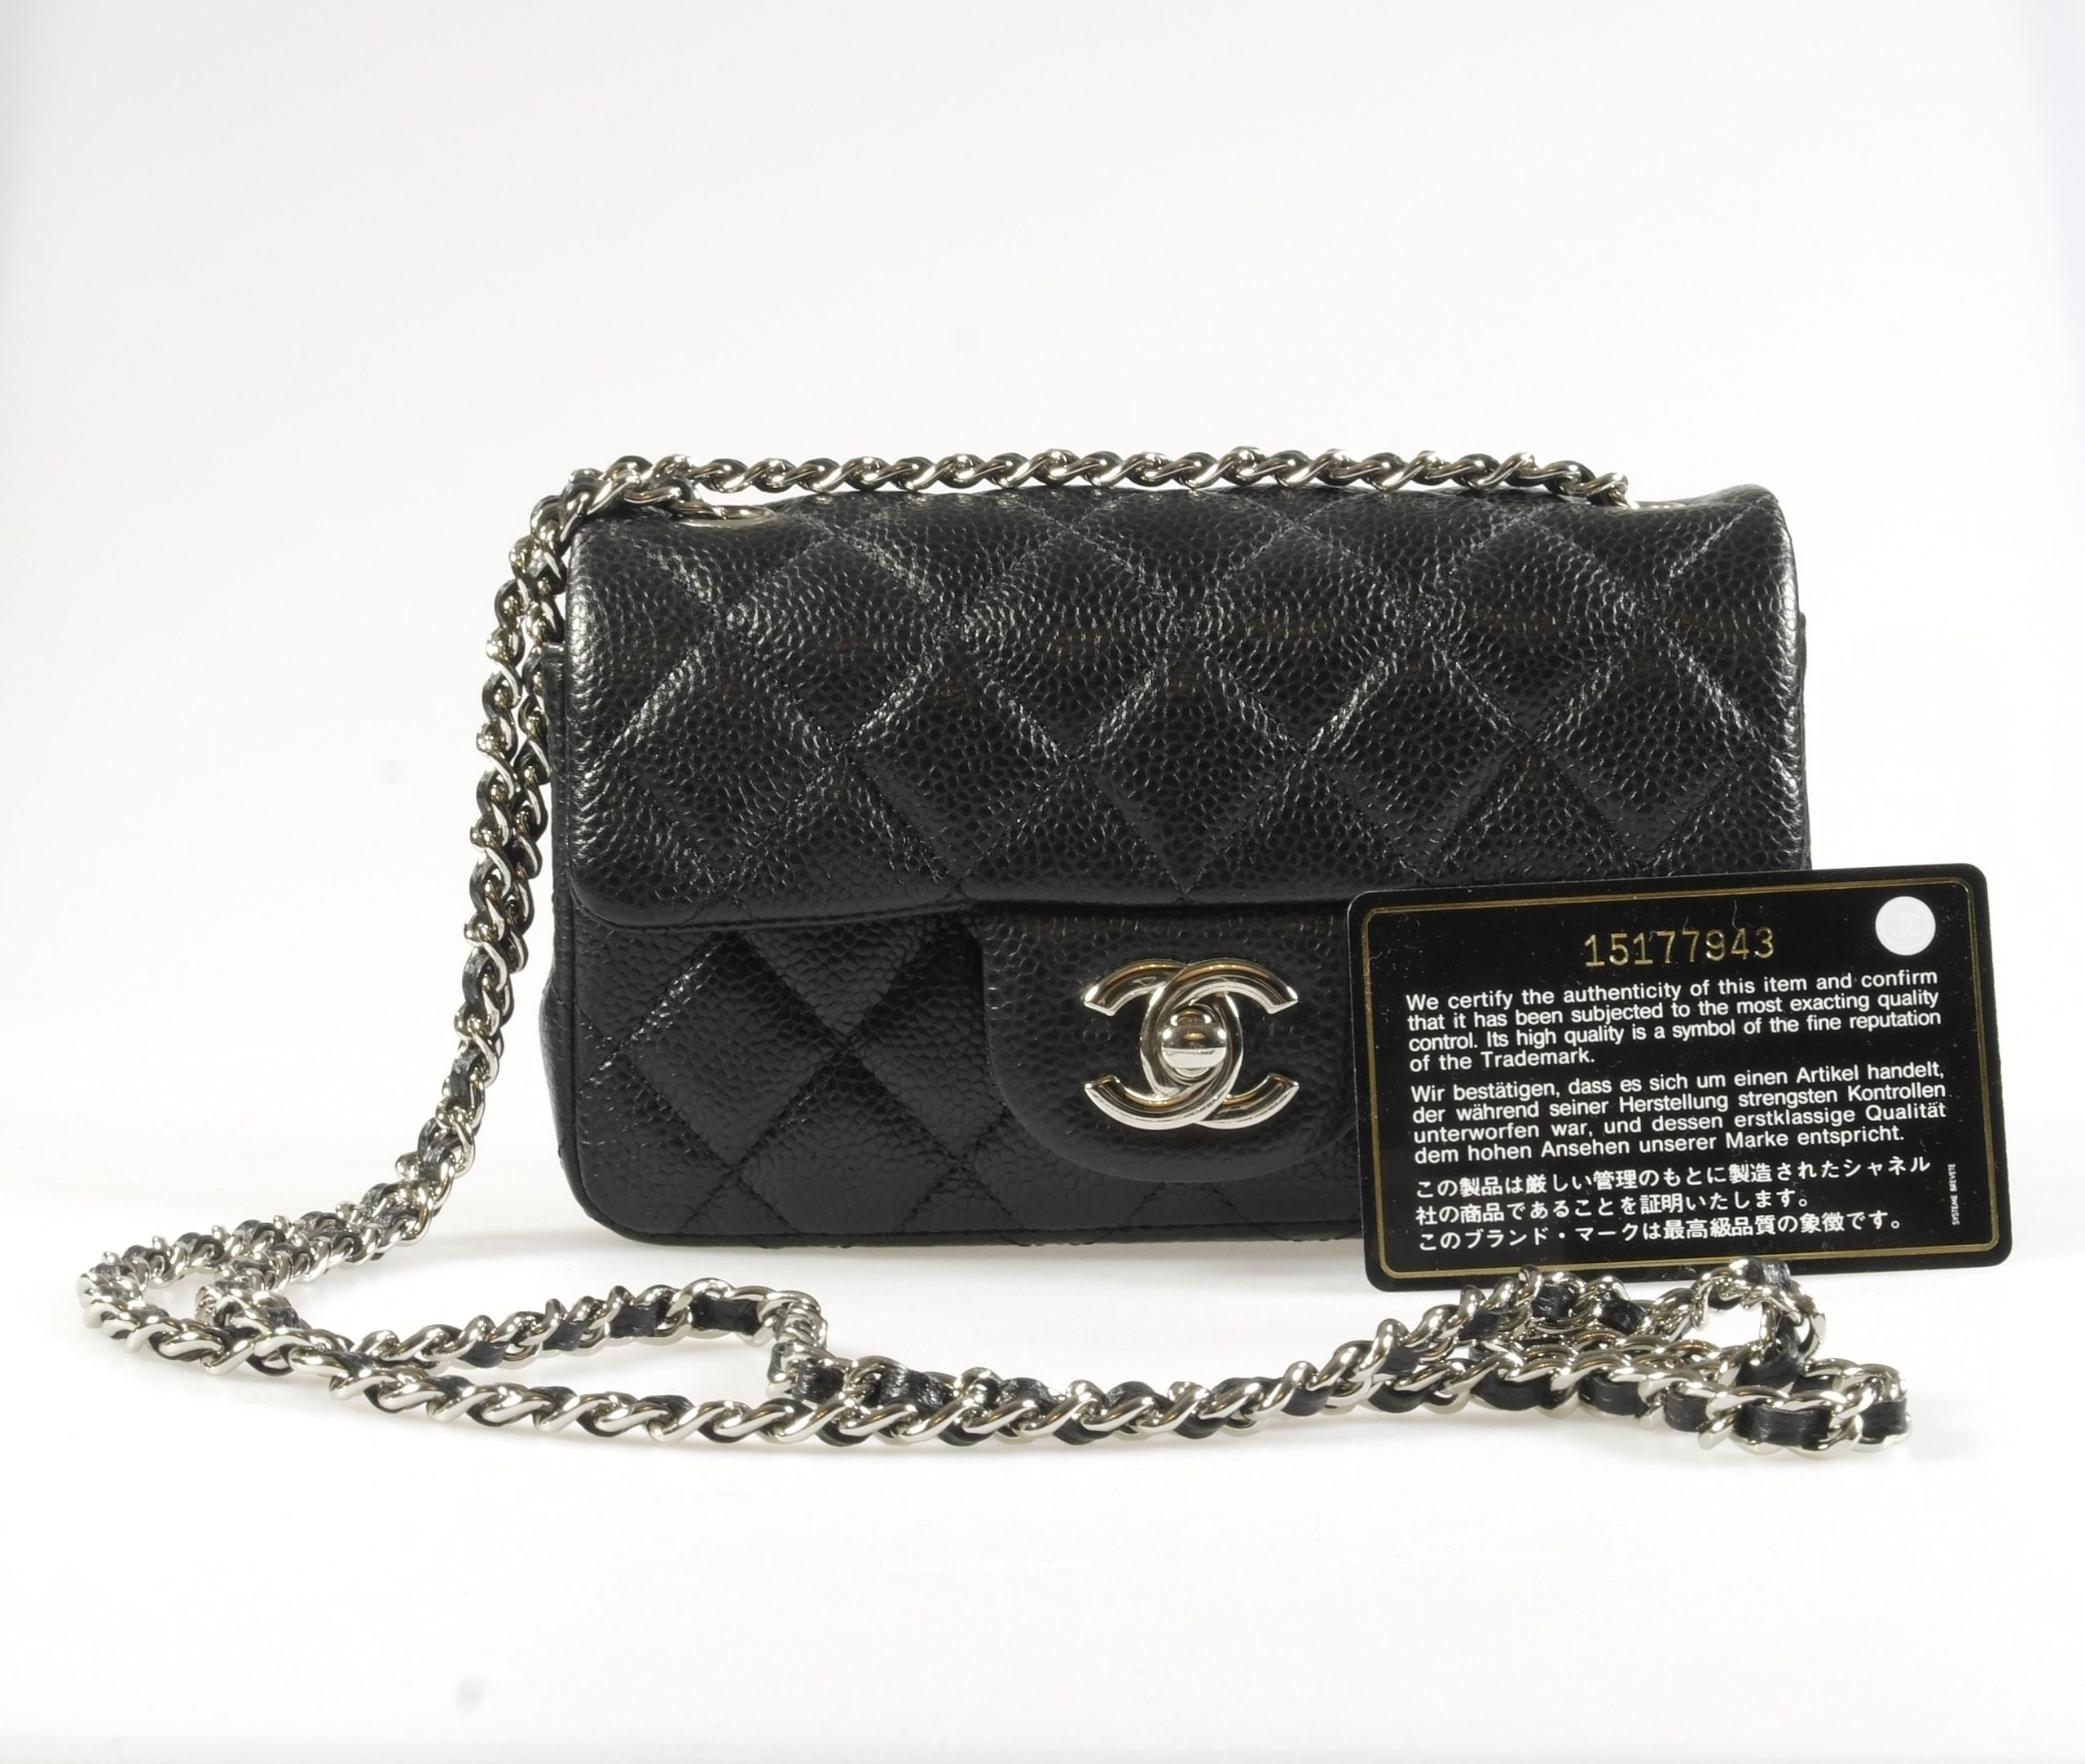 c1f6ab839956b1 Chanel Classic mini rectangular flap bag SOLD | Expensive Bag Dream ...